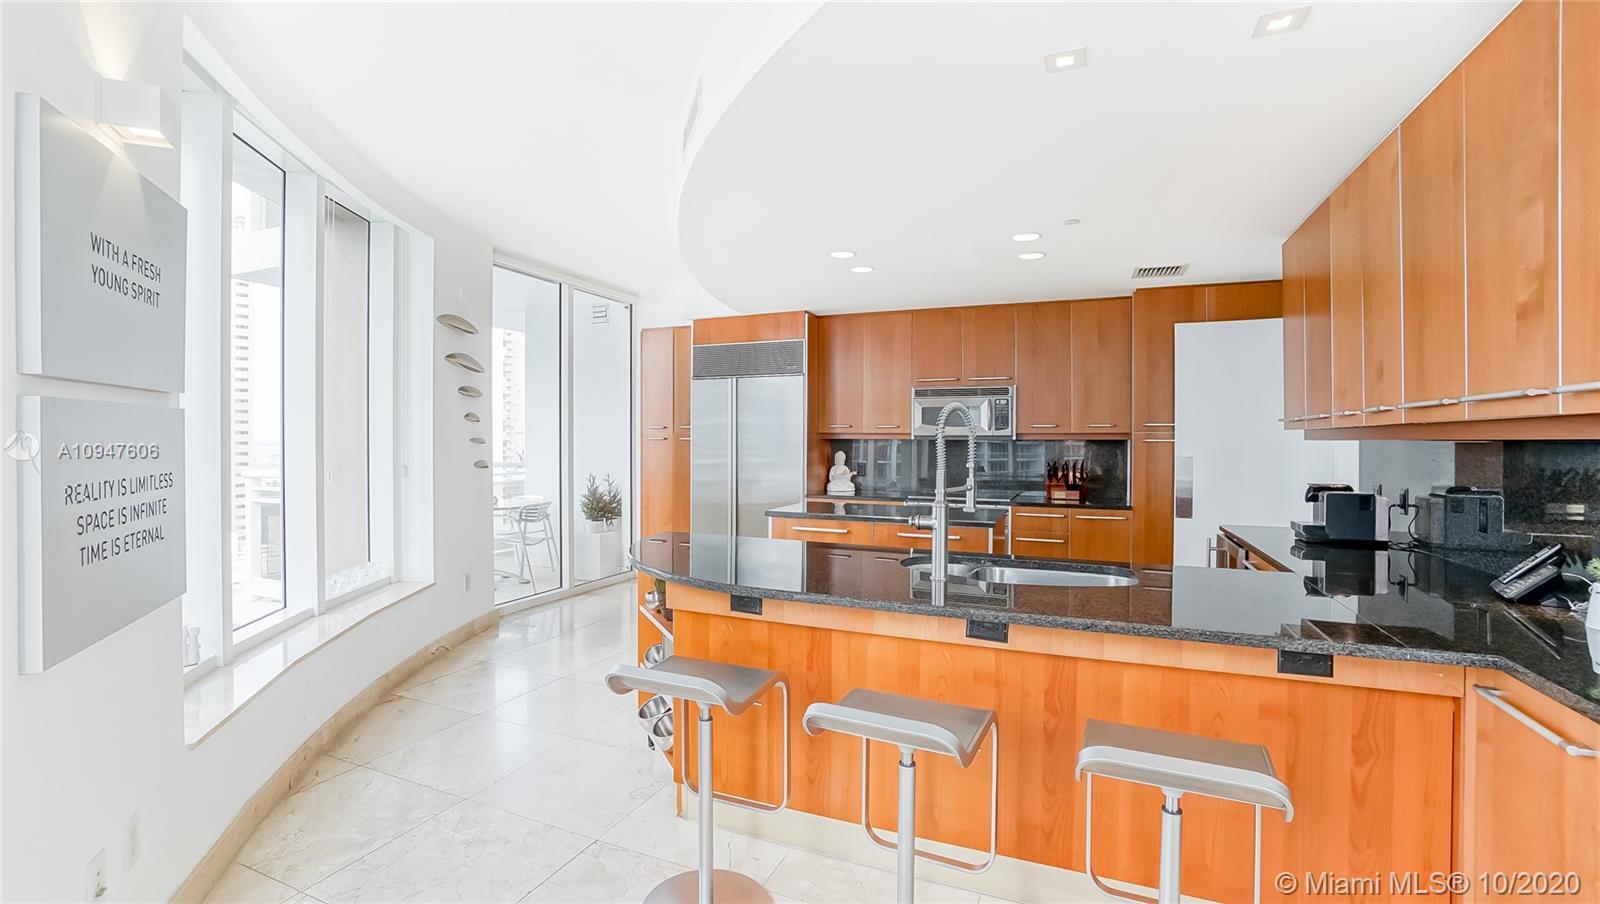 901 Brickell Key Blvd # 2204, Miami, Florida 33131, 3 Bedrooms Bedrooms, ,4 BathroomsBathrooms,Residential,For Sale,901 Brickell Key Blvd # 2204,A10947606